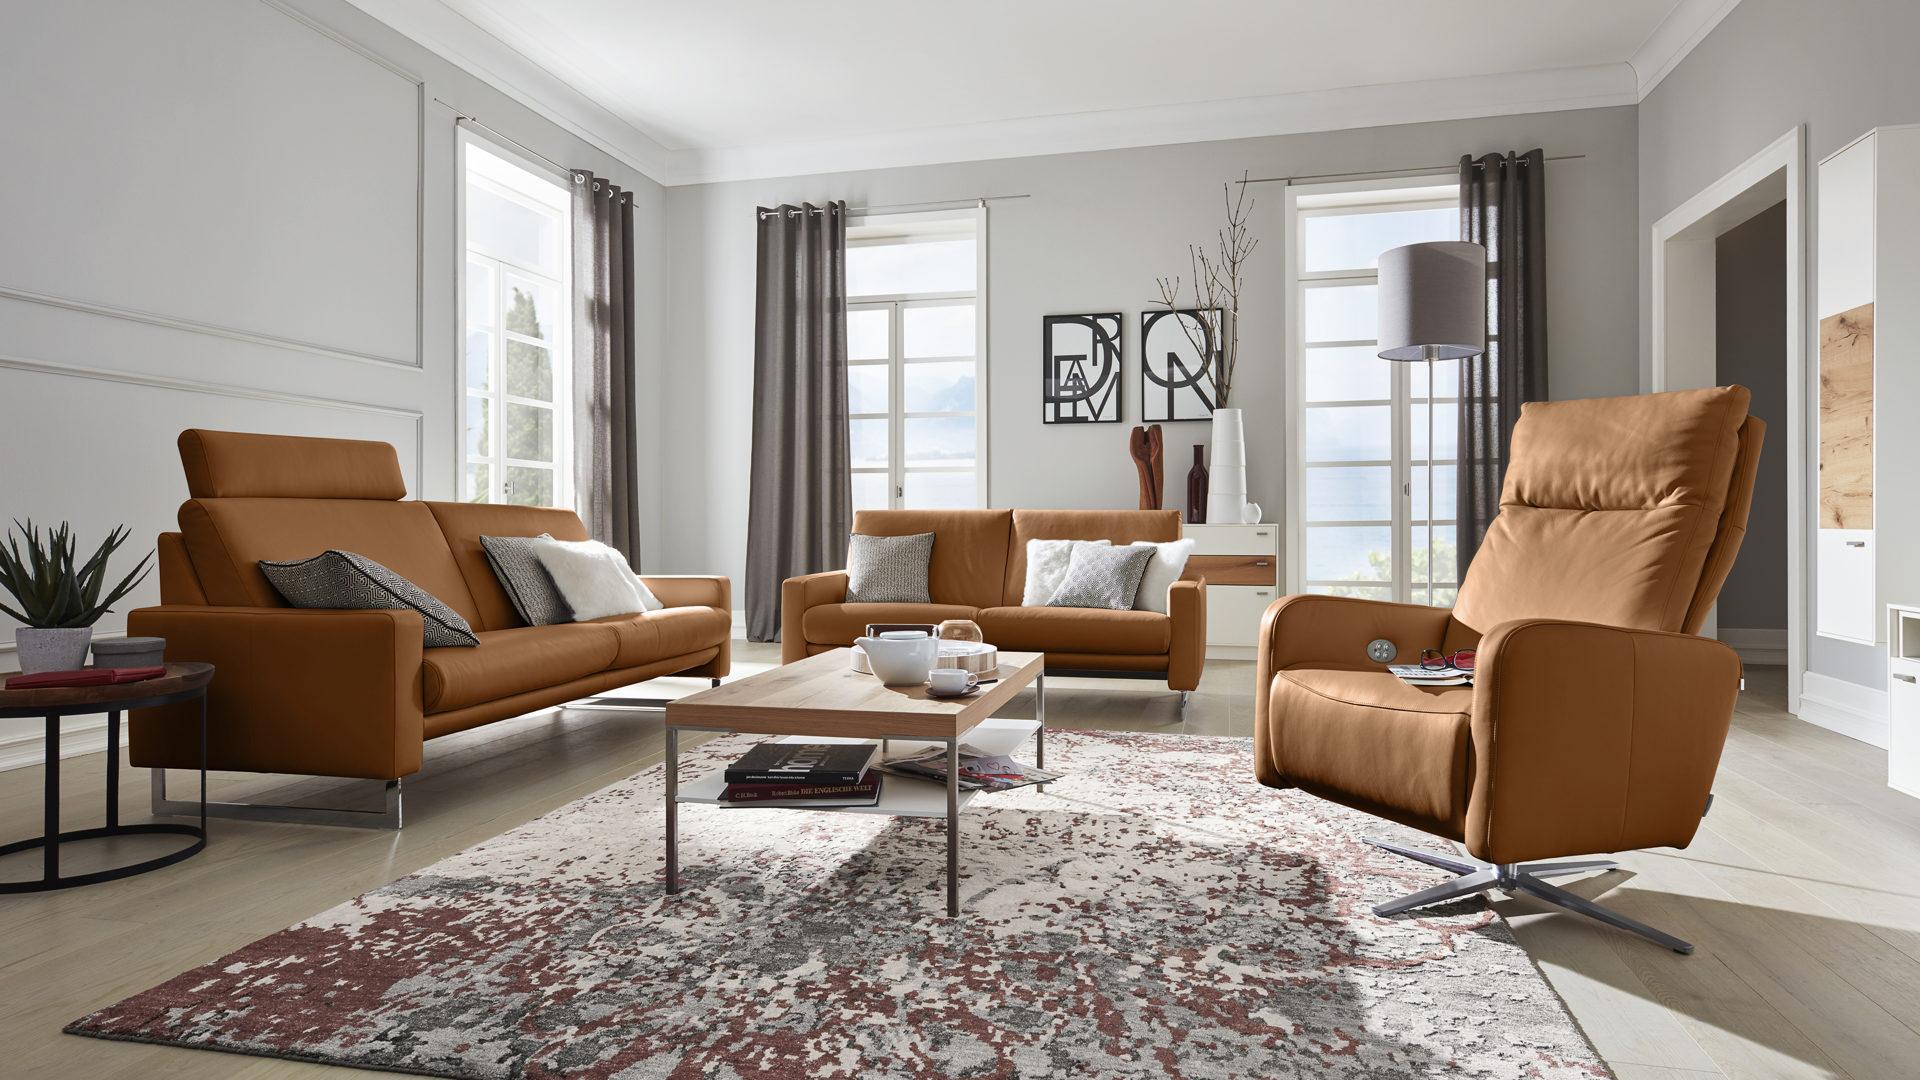 Interliving Sofa Serie 4001 Ledergarnitur Cognacfarbenes Leder